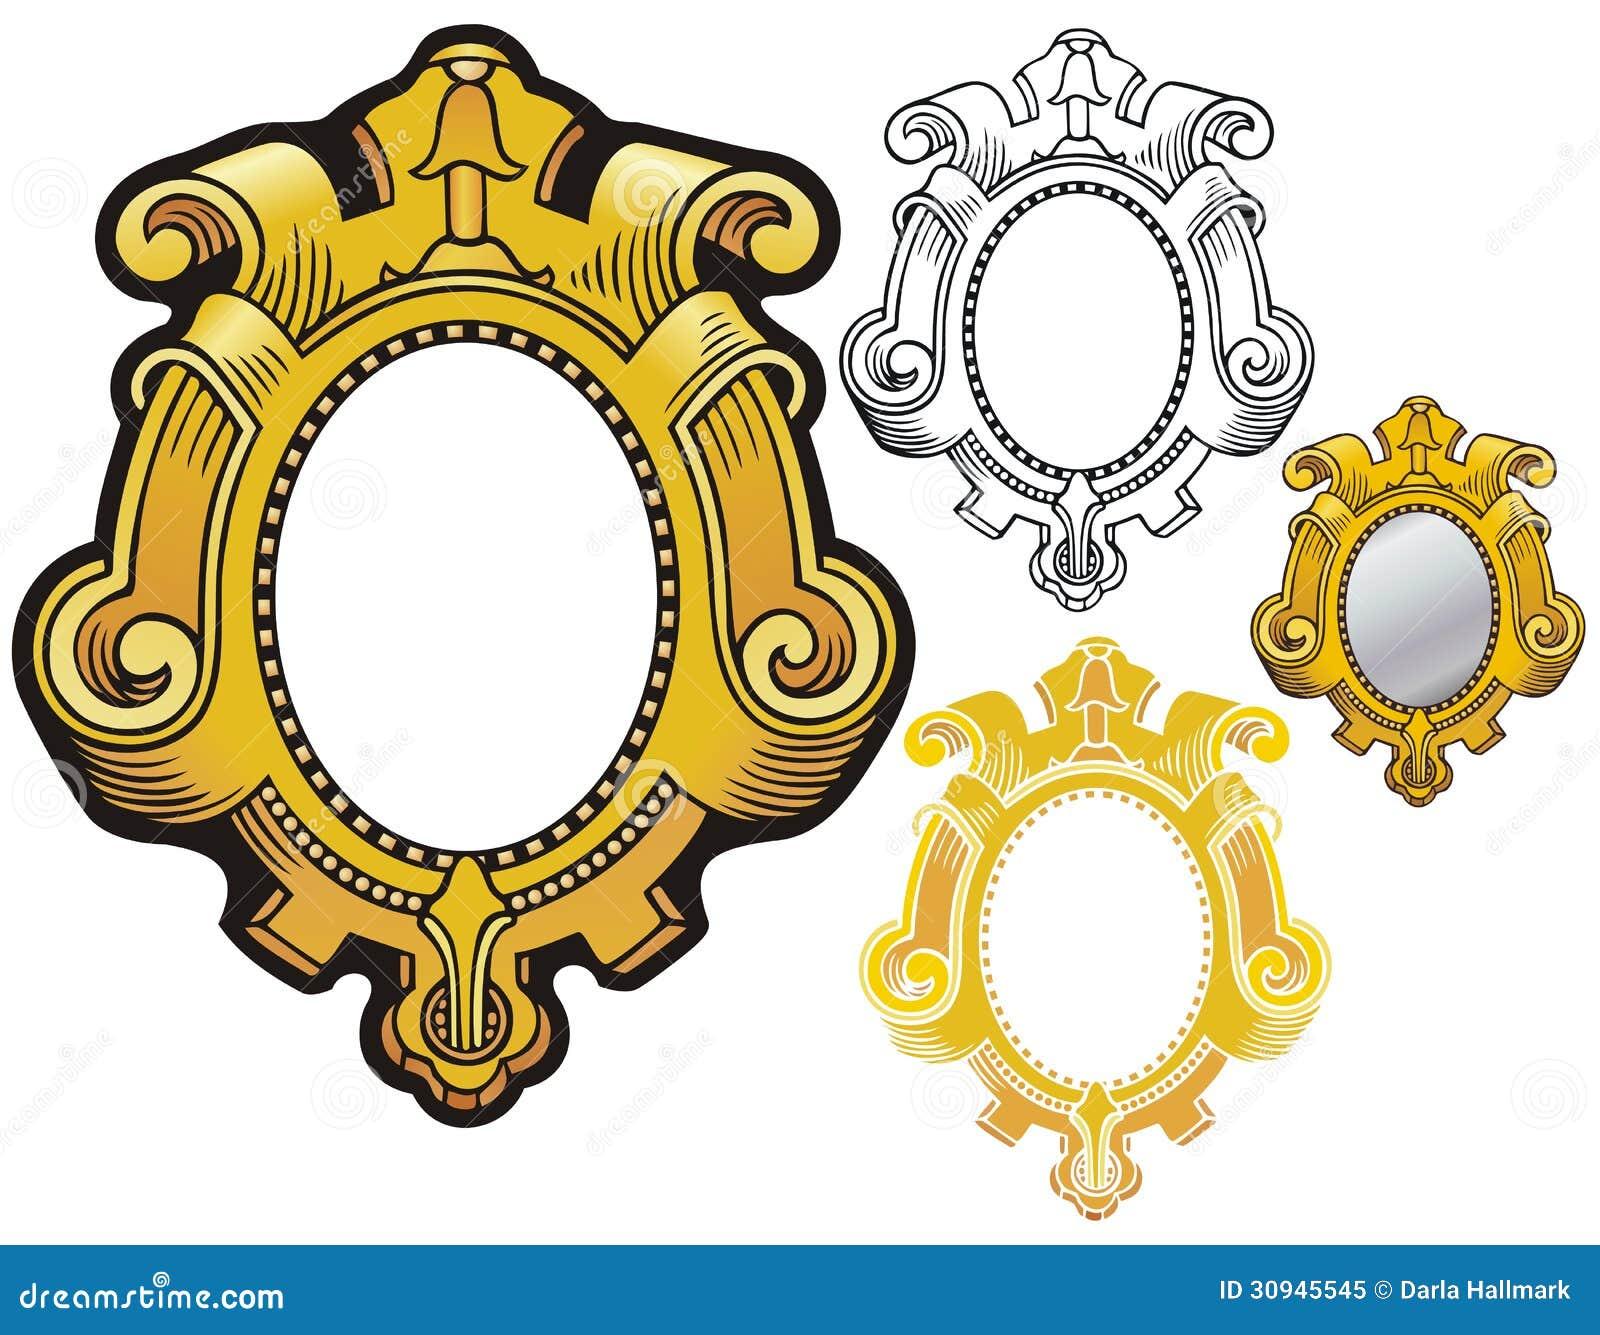 Ornate renaissance style border like a carved, gilded mirror frame.